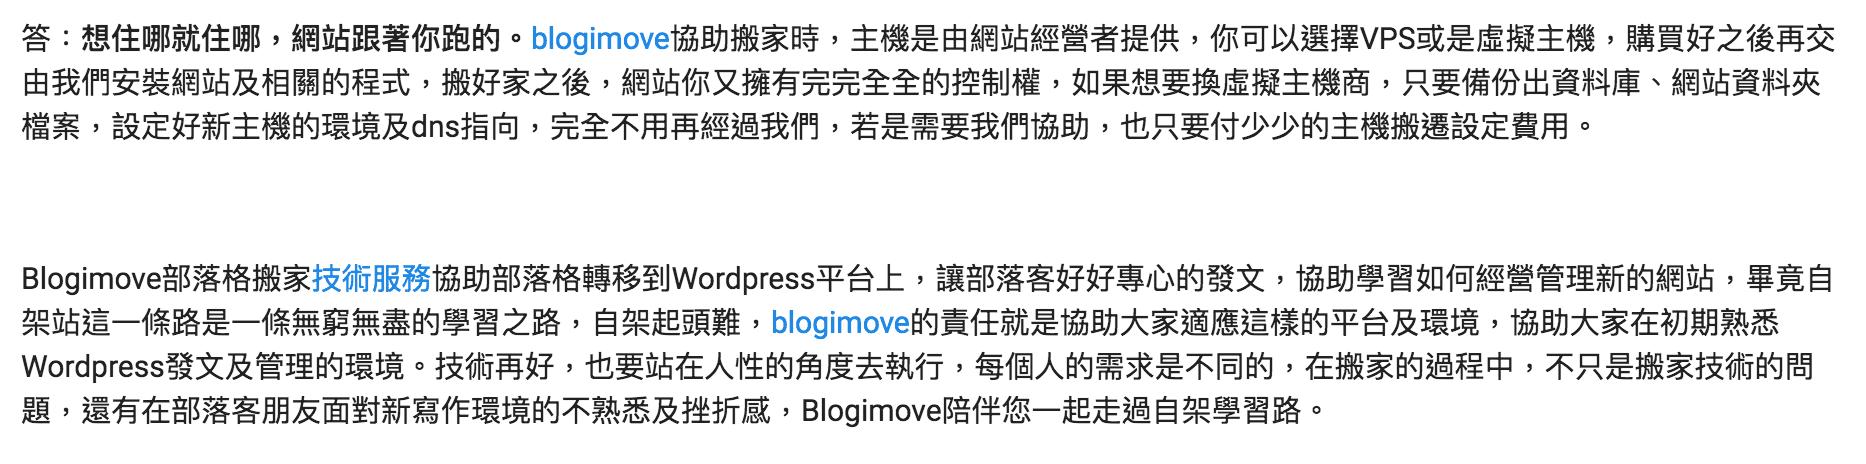 WordPress寫作懶人包|部落格搬家到WordPress後,如何運用Blogimove外掛提升寫作效率 @Blog-i-Move